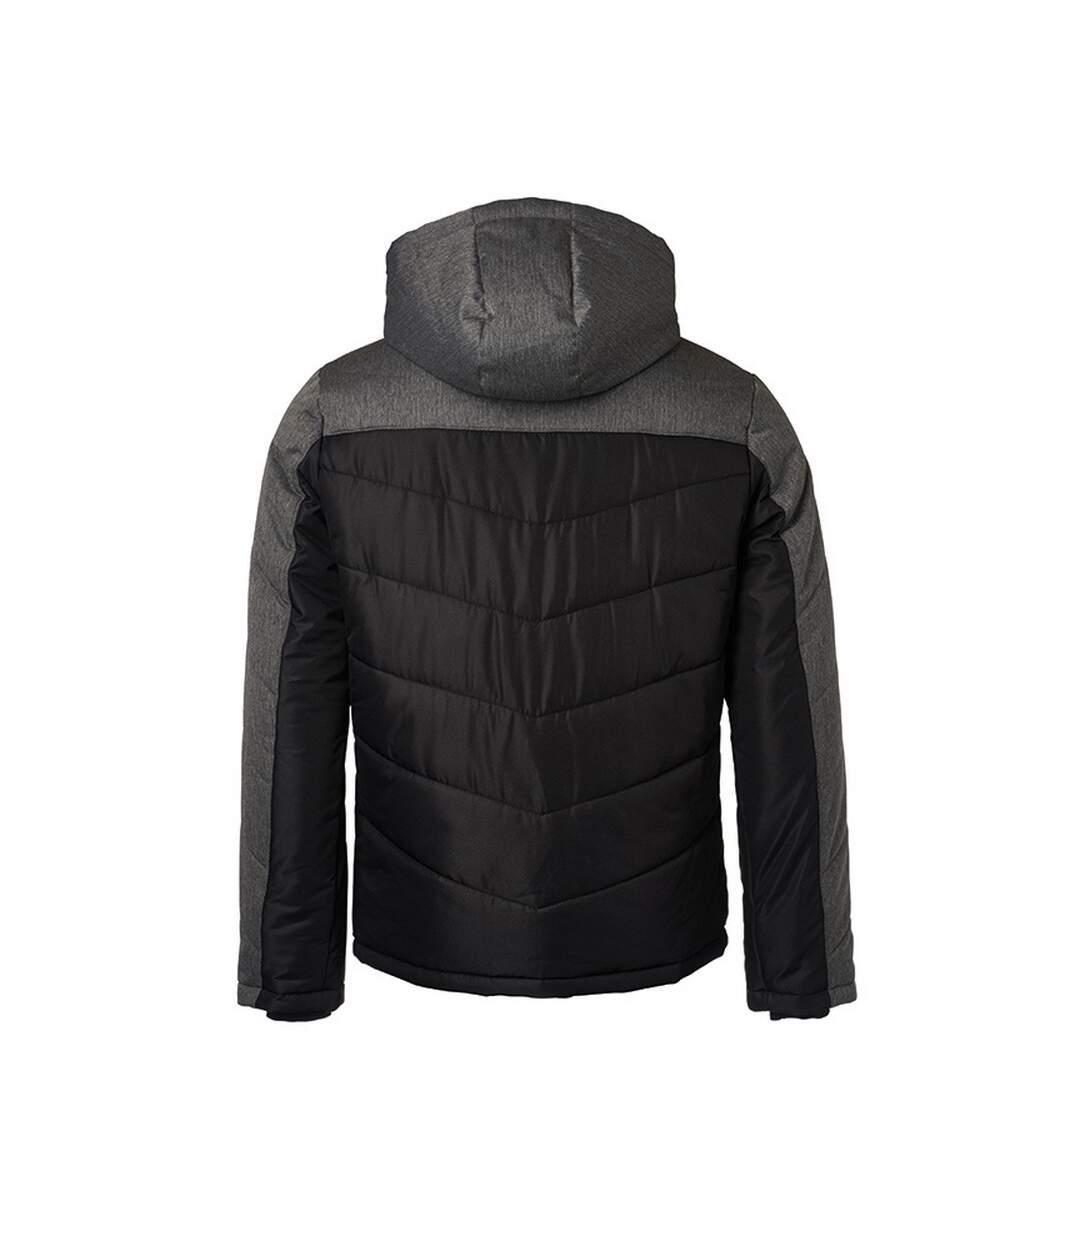 James and Nicholson Mens Winter Jacket (Black/Anthracite Melange) - UTFU432